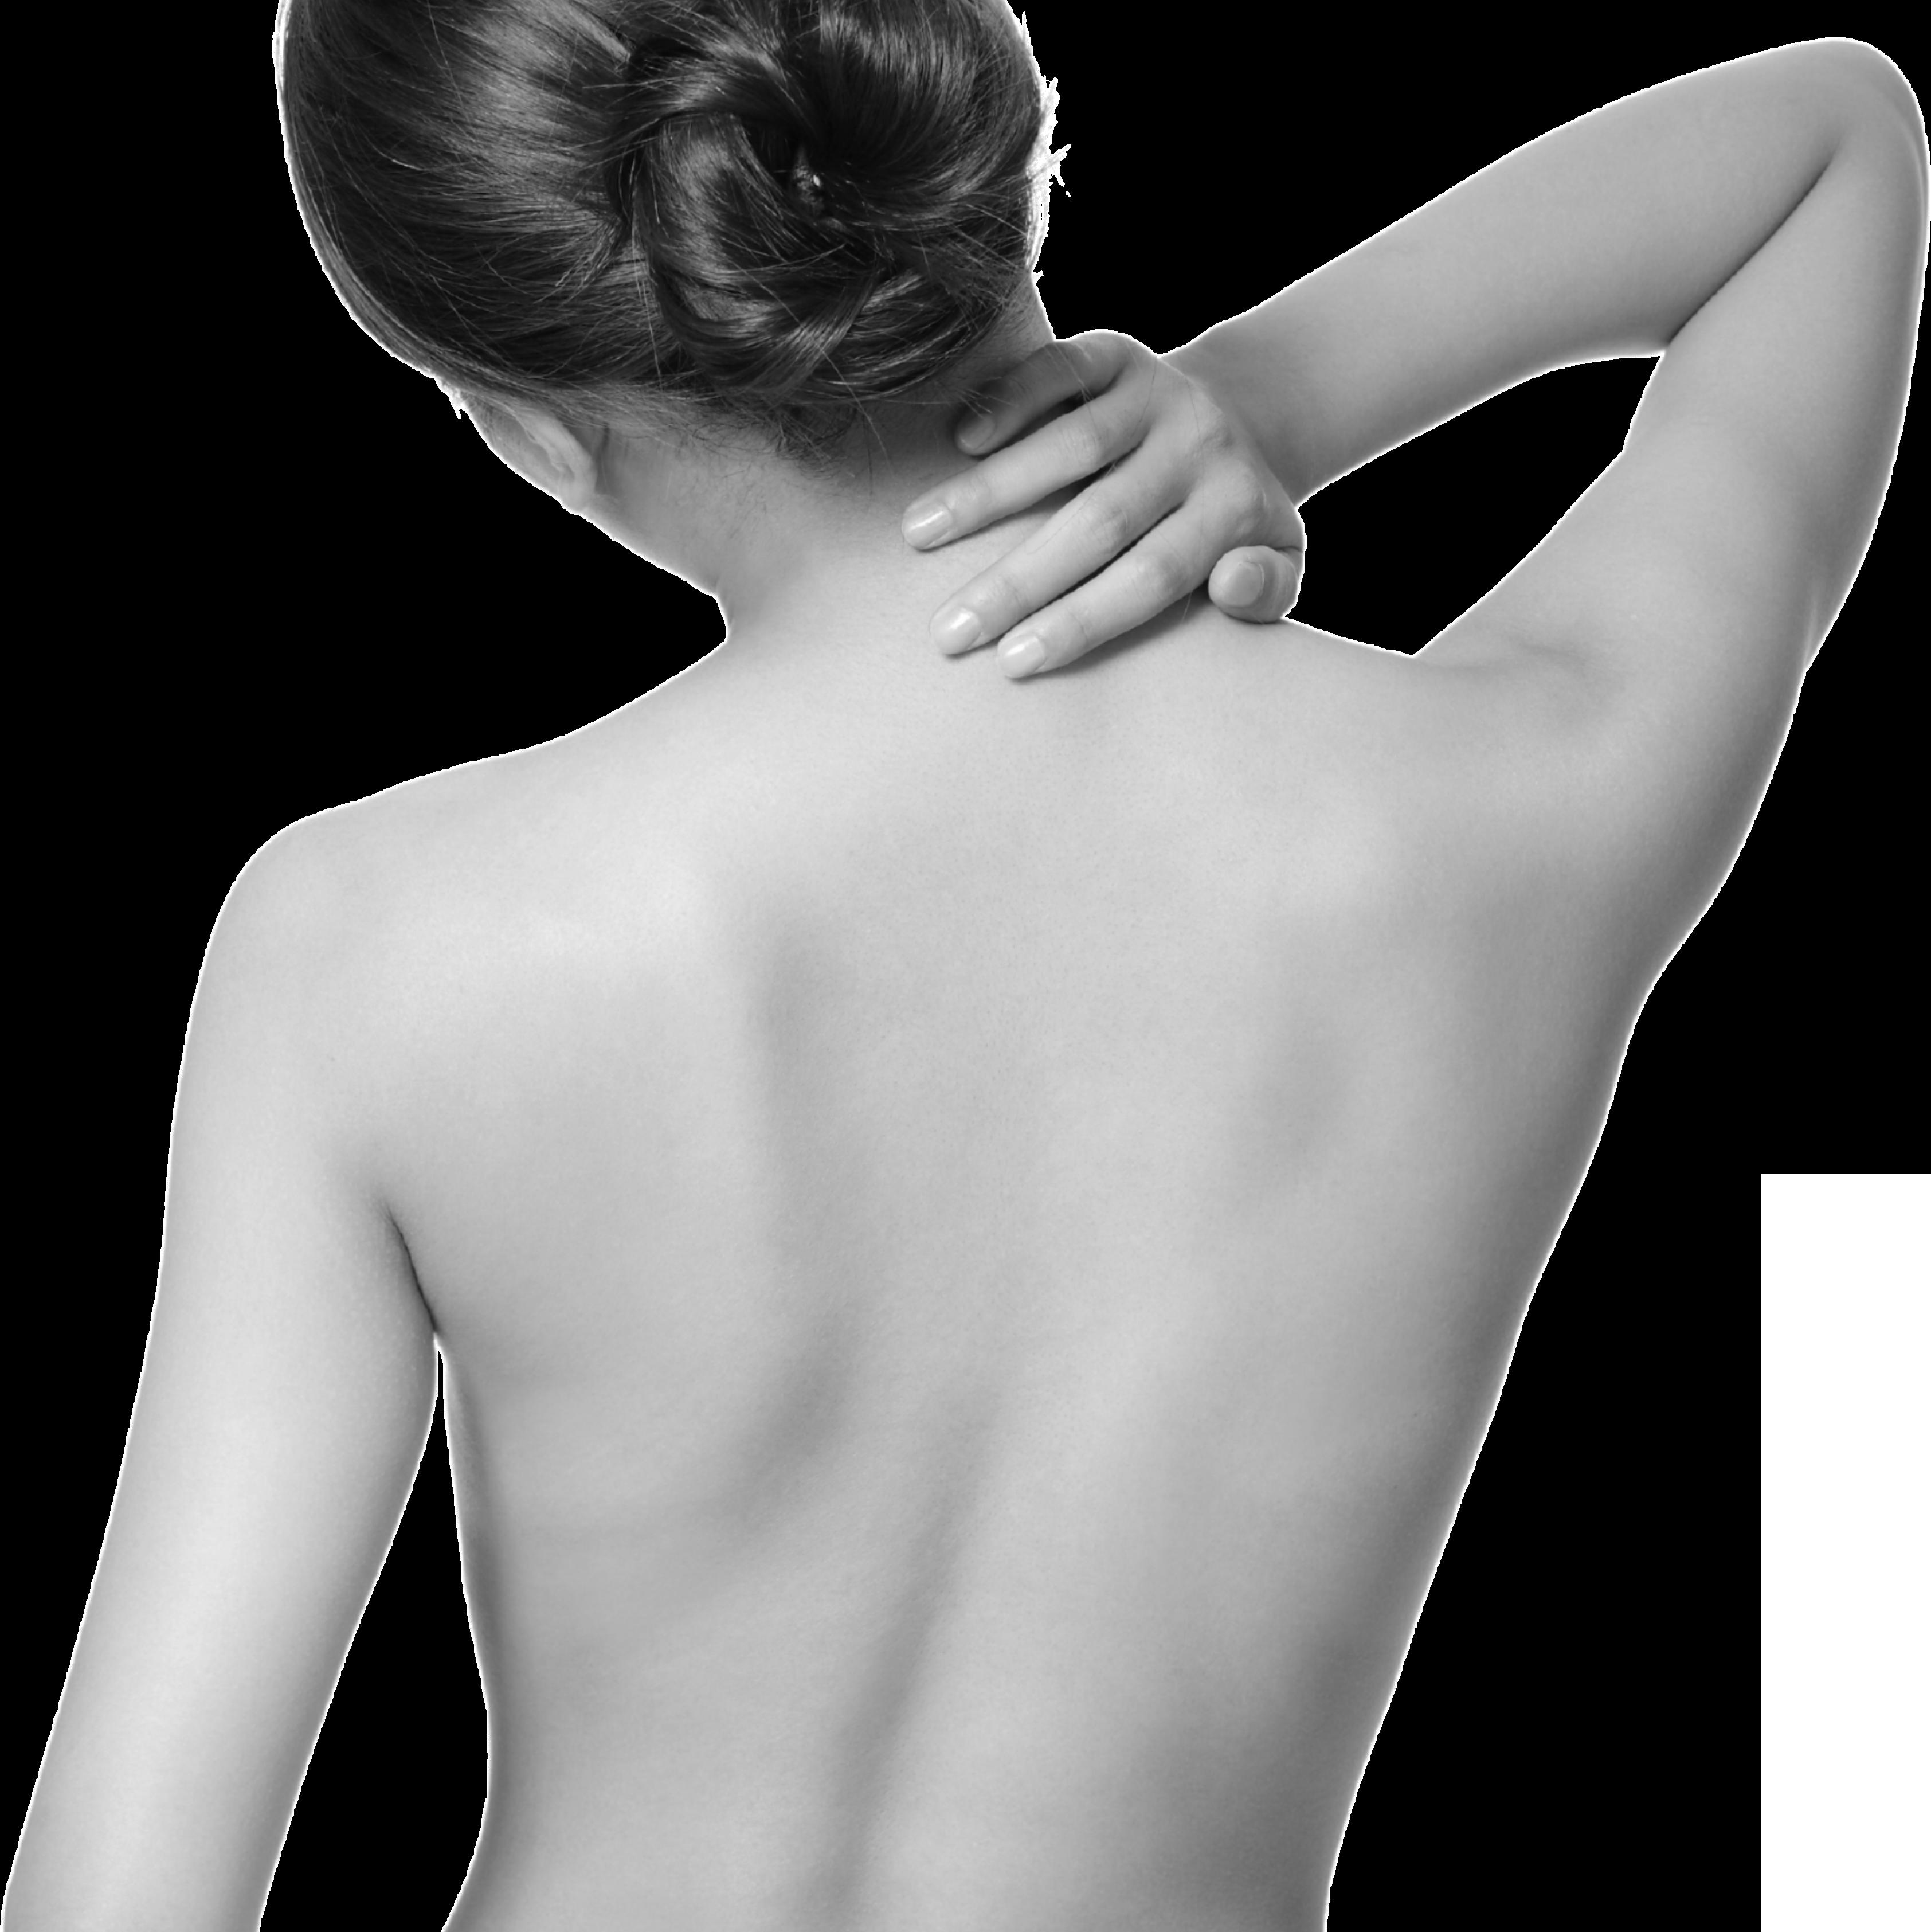 Skin Code LA Service - Women's Laser Hair Removal Back